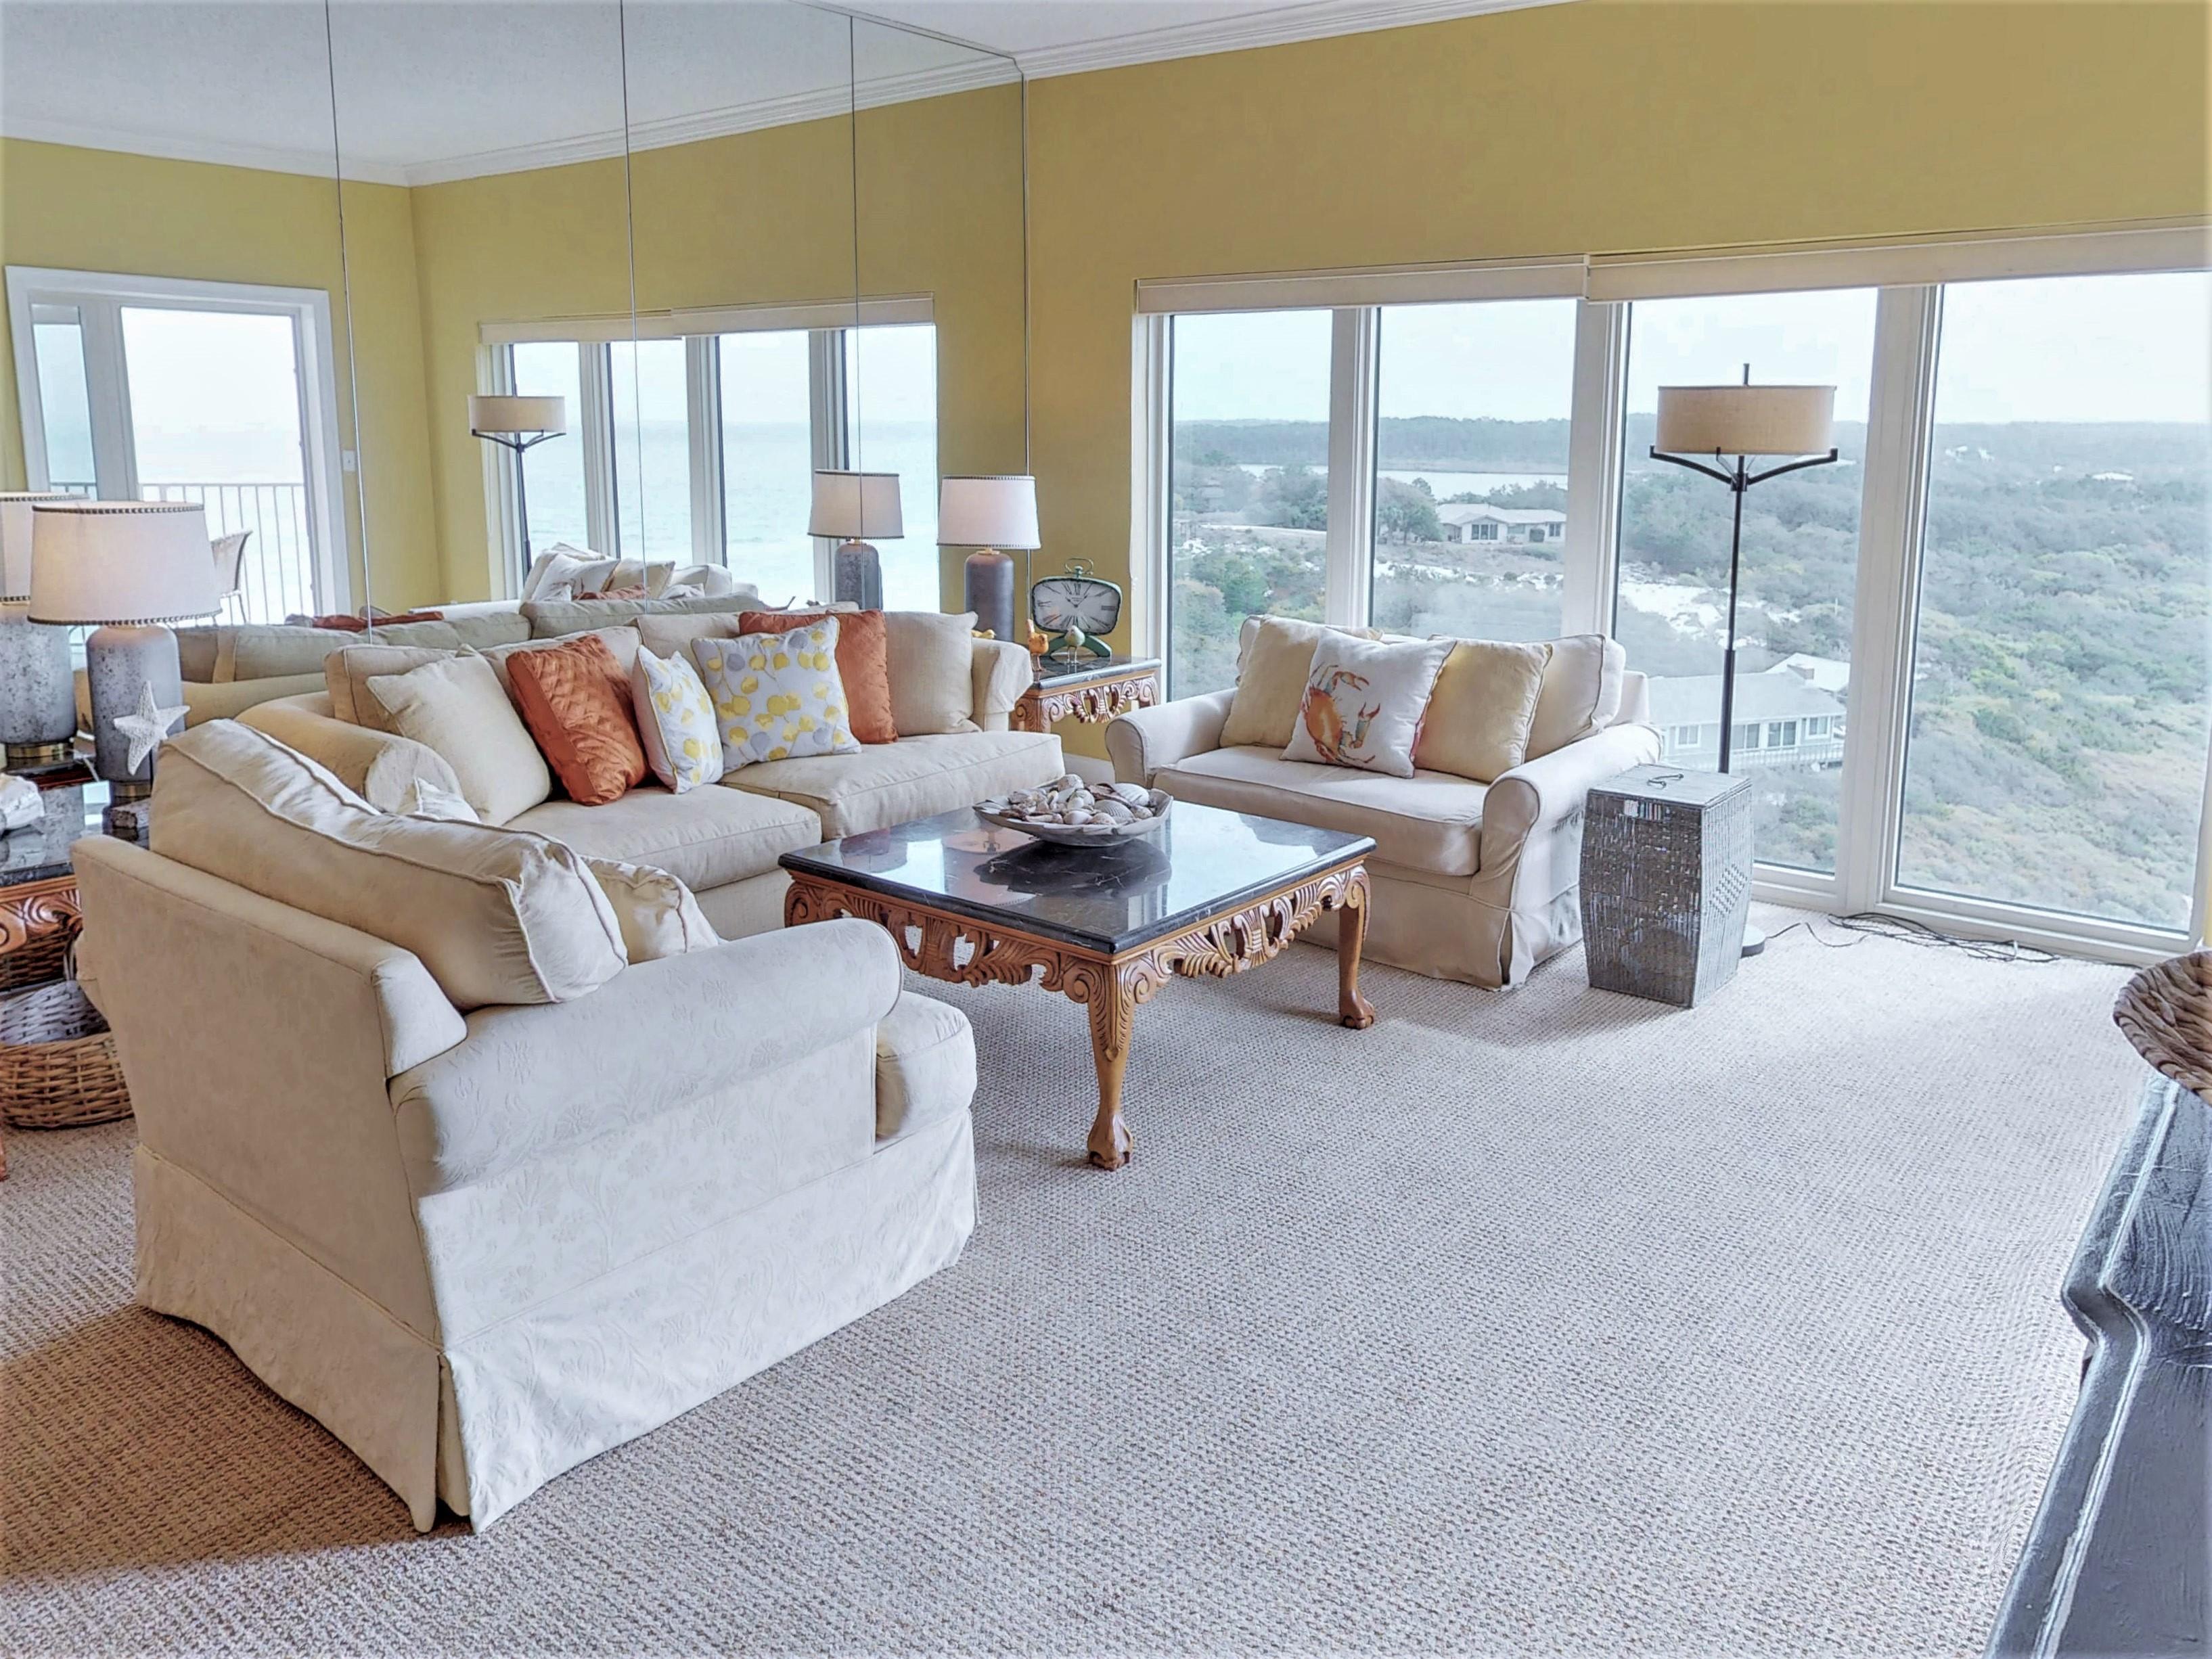 905 Tops'l Beach Manor Condo rental in TOPS'L Beach Manor  in Destin Florida - #4